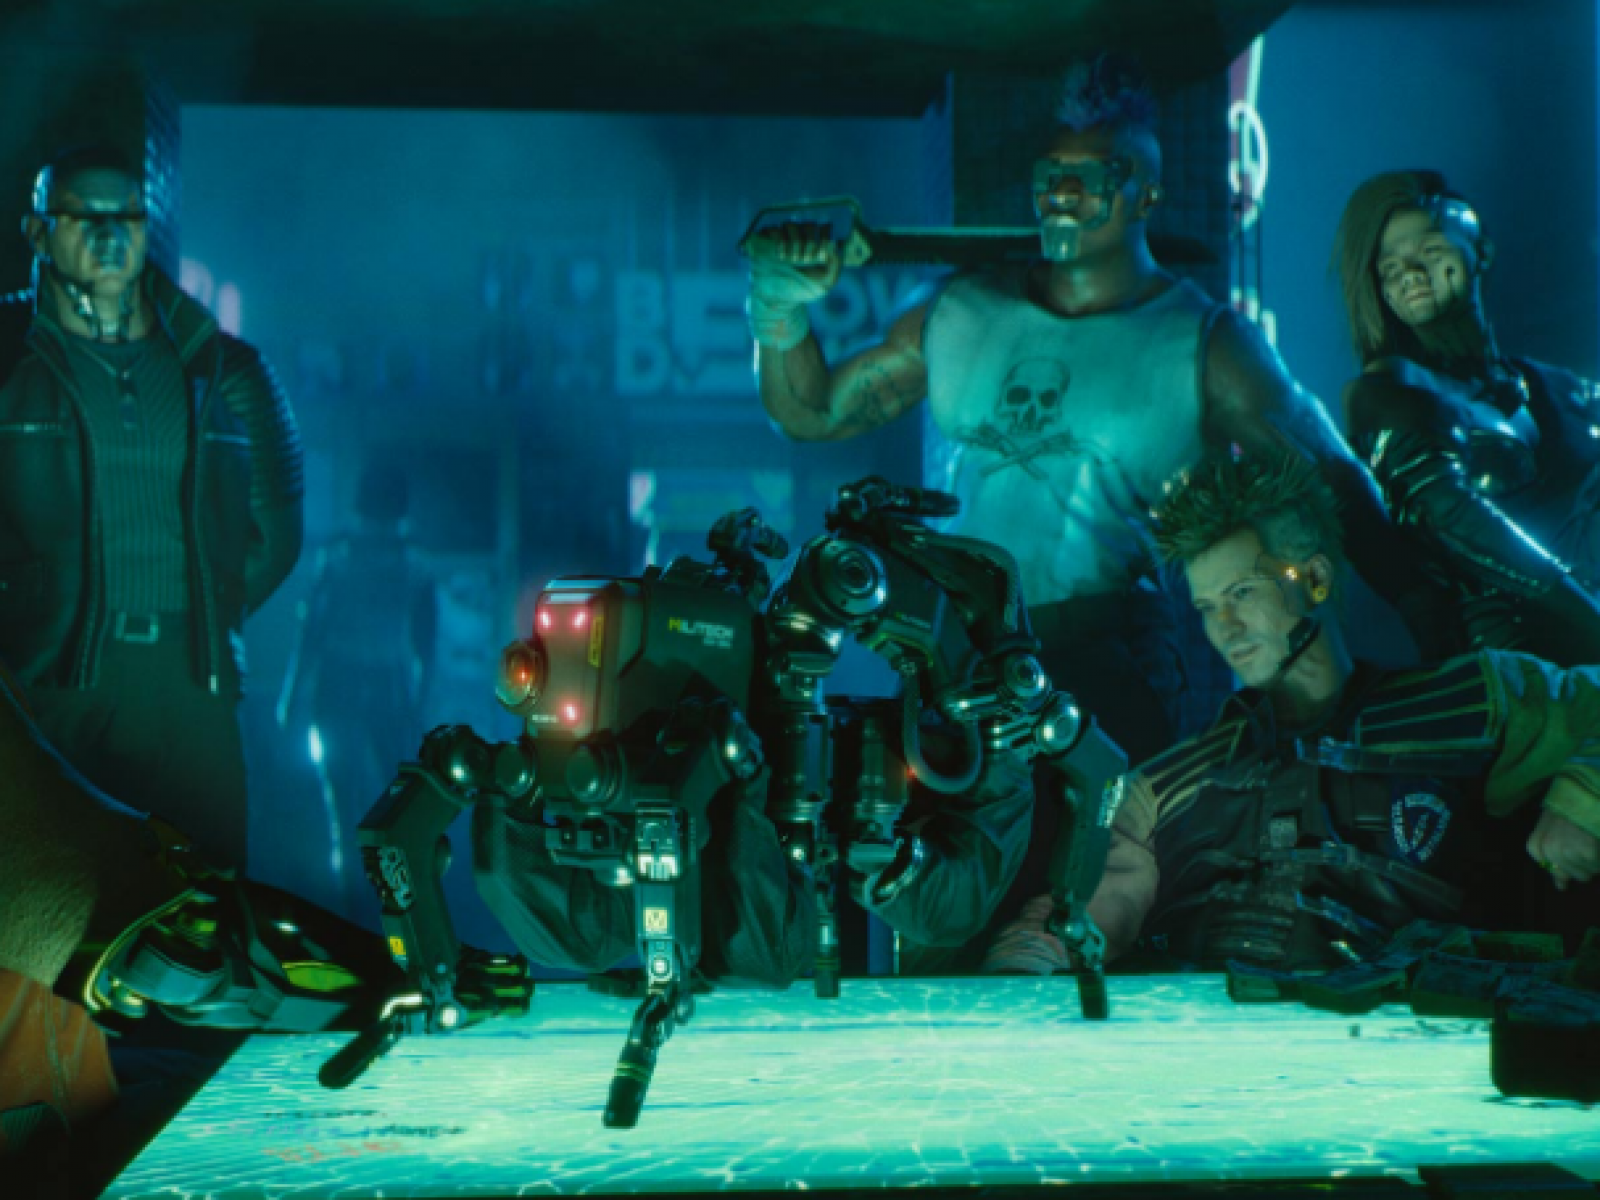 Cyberpunk 2077' Will Have Gender Fluid Character Creator